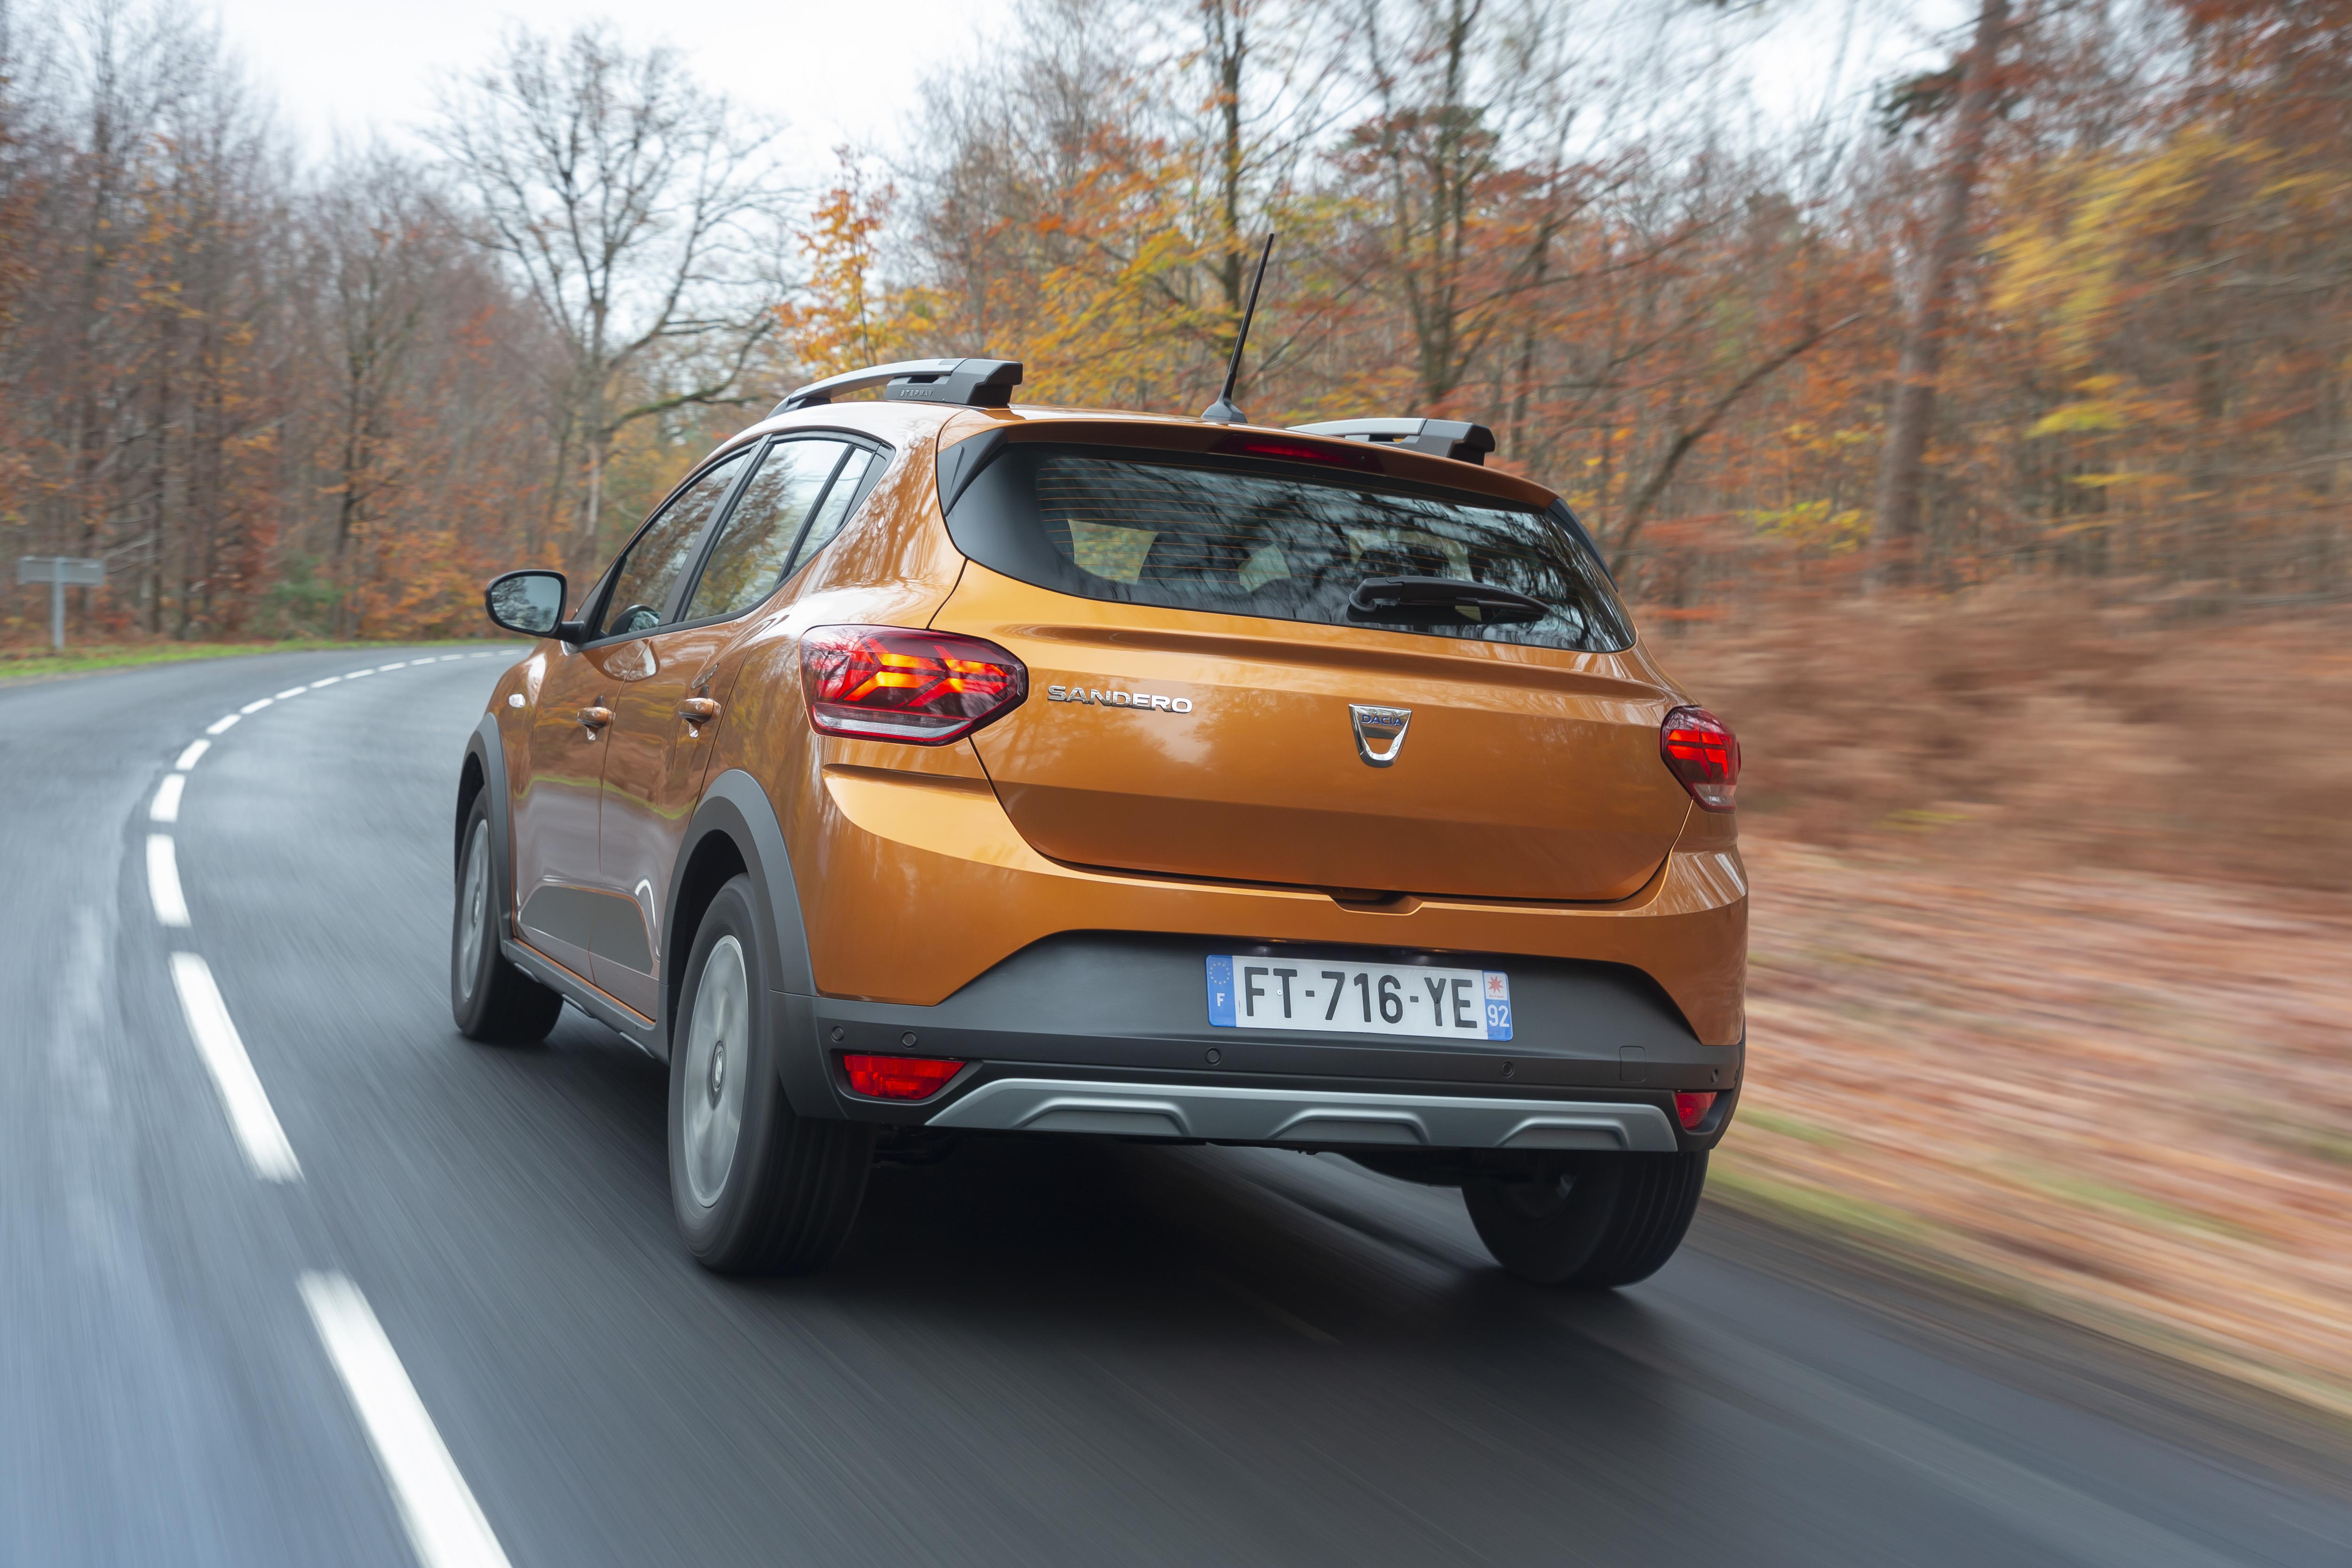 2020 - Essais presse Nouvelle Dacia SANDERO STEPWAY (9)